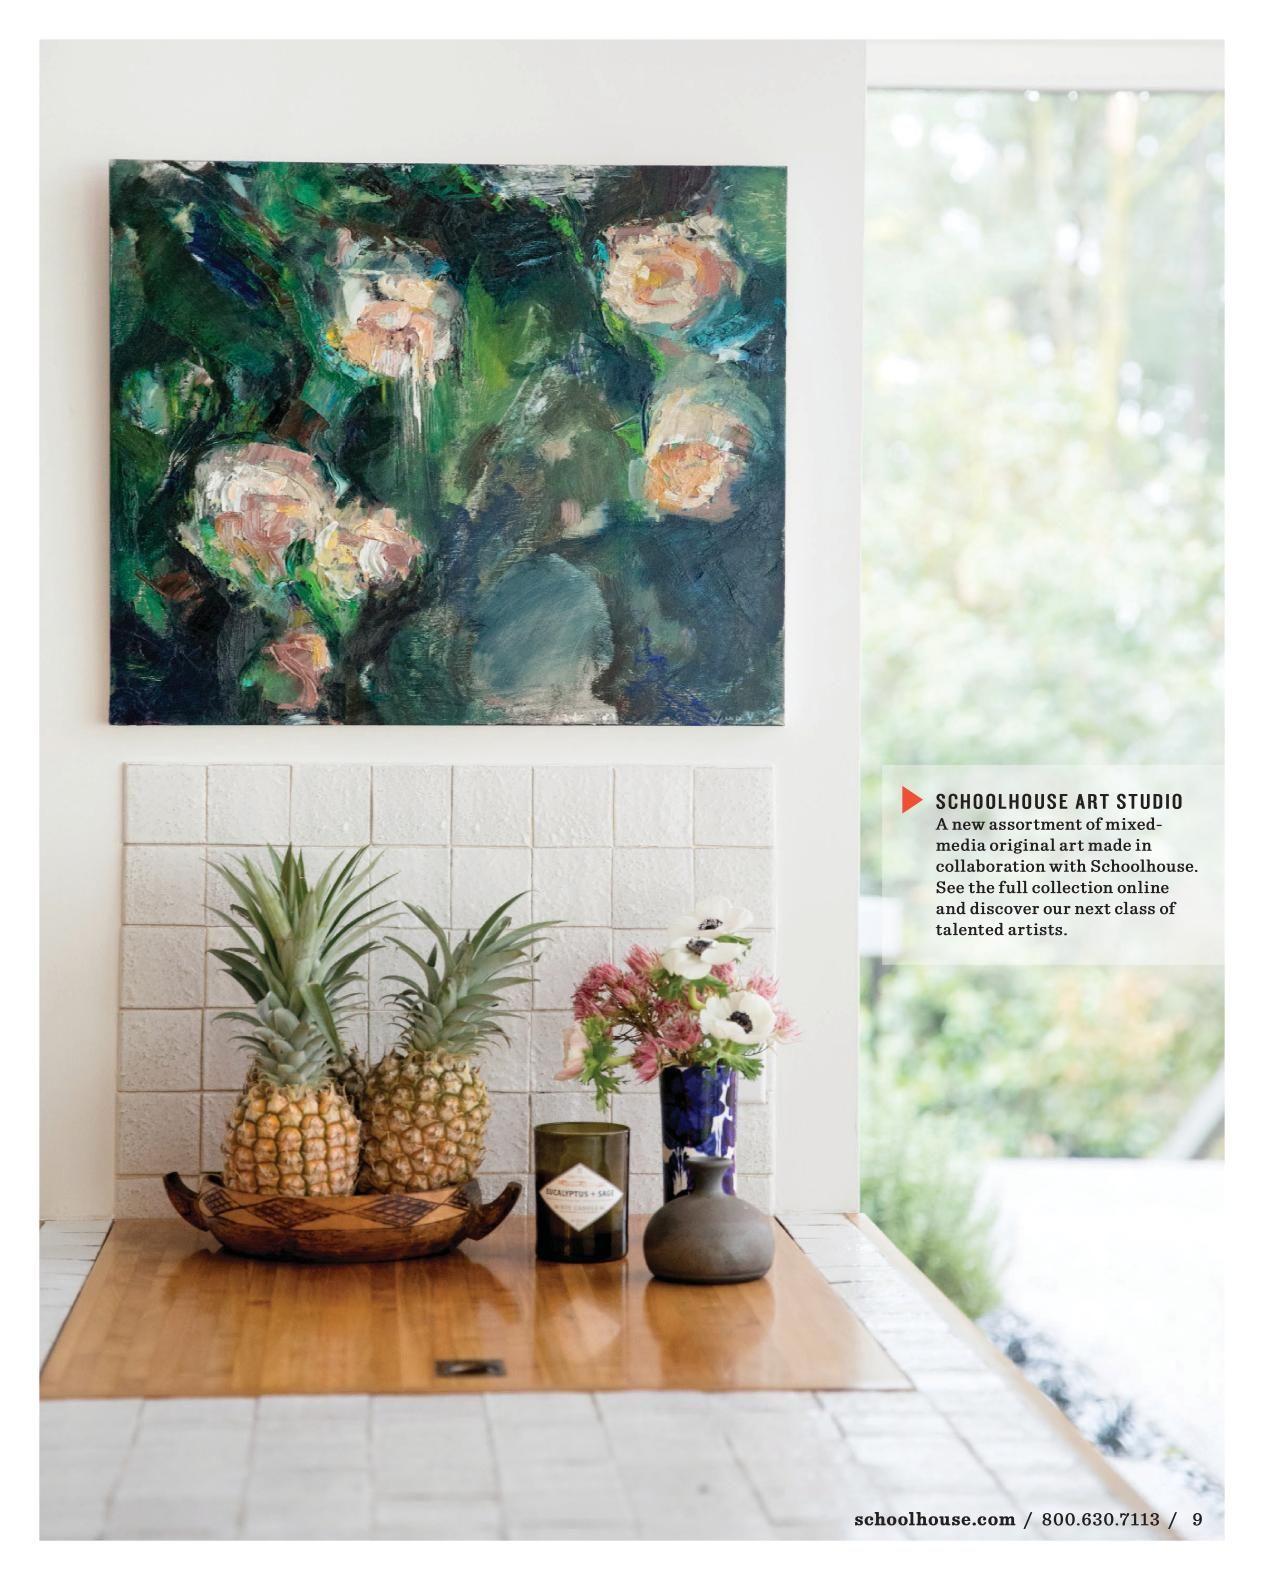 Schoolhouse Electric Catalogs | Decor, Modern decor, Home ...